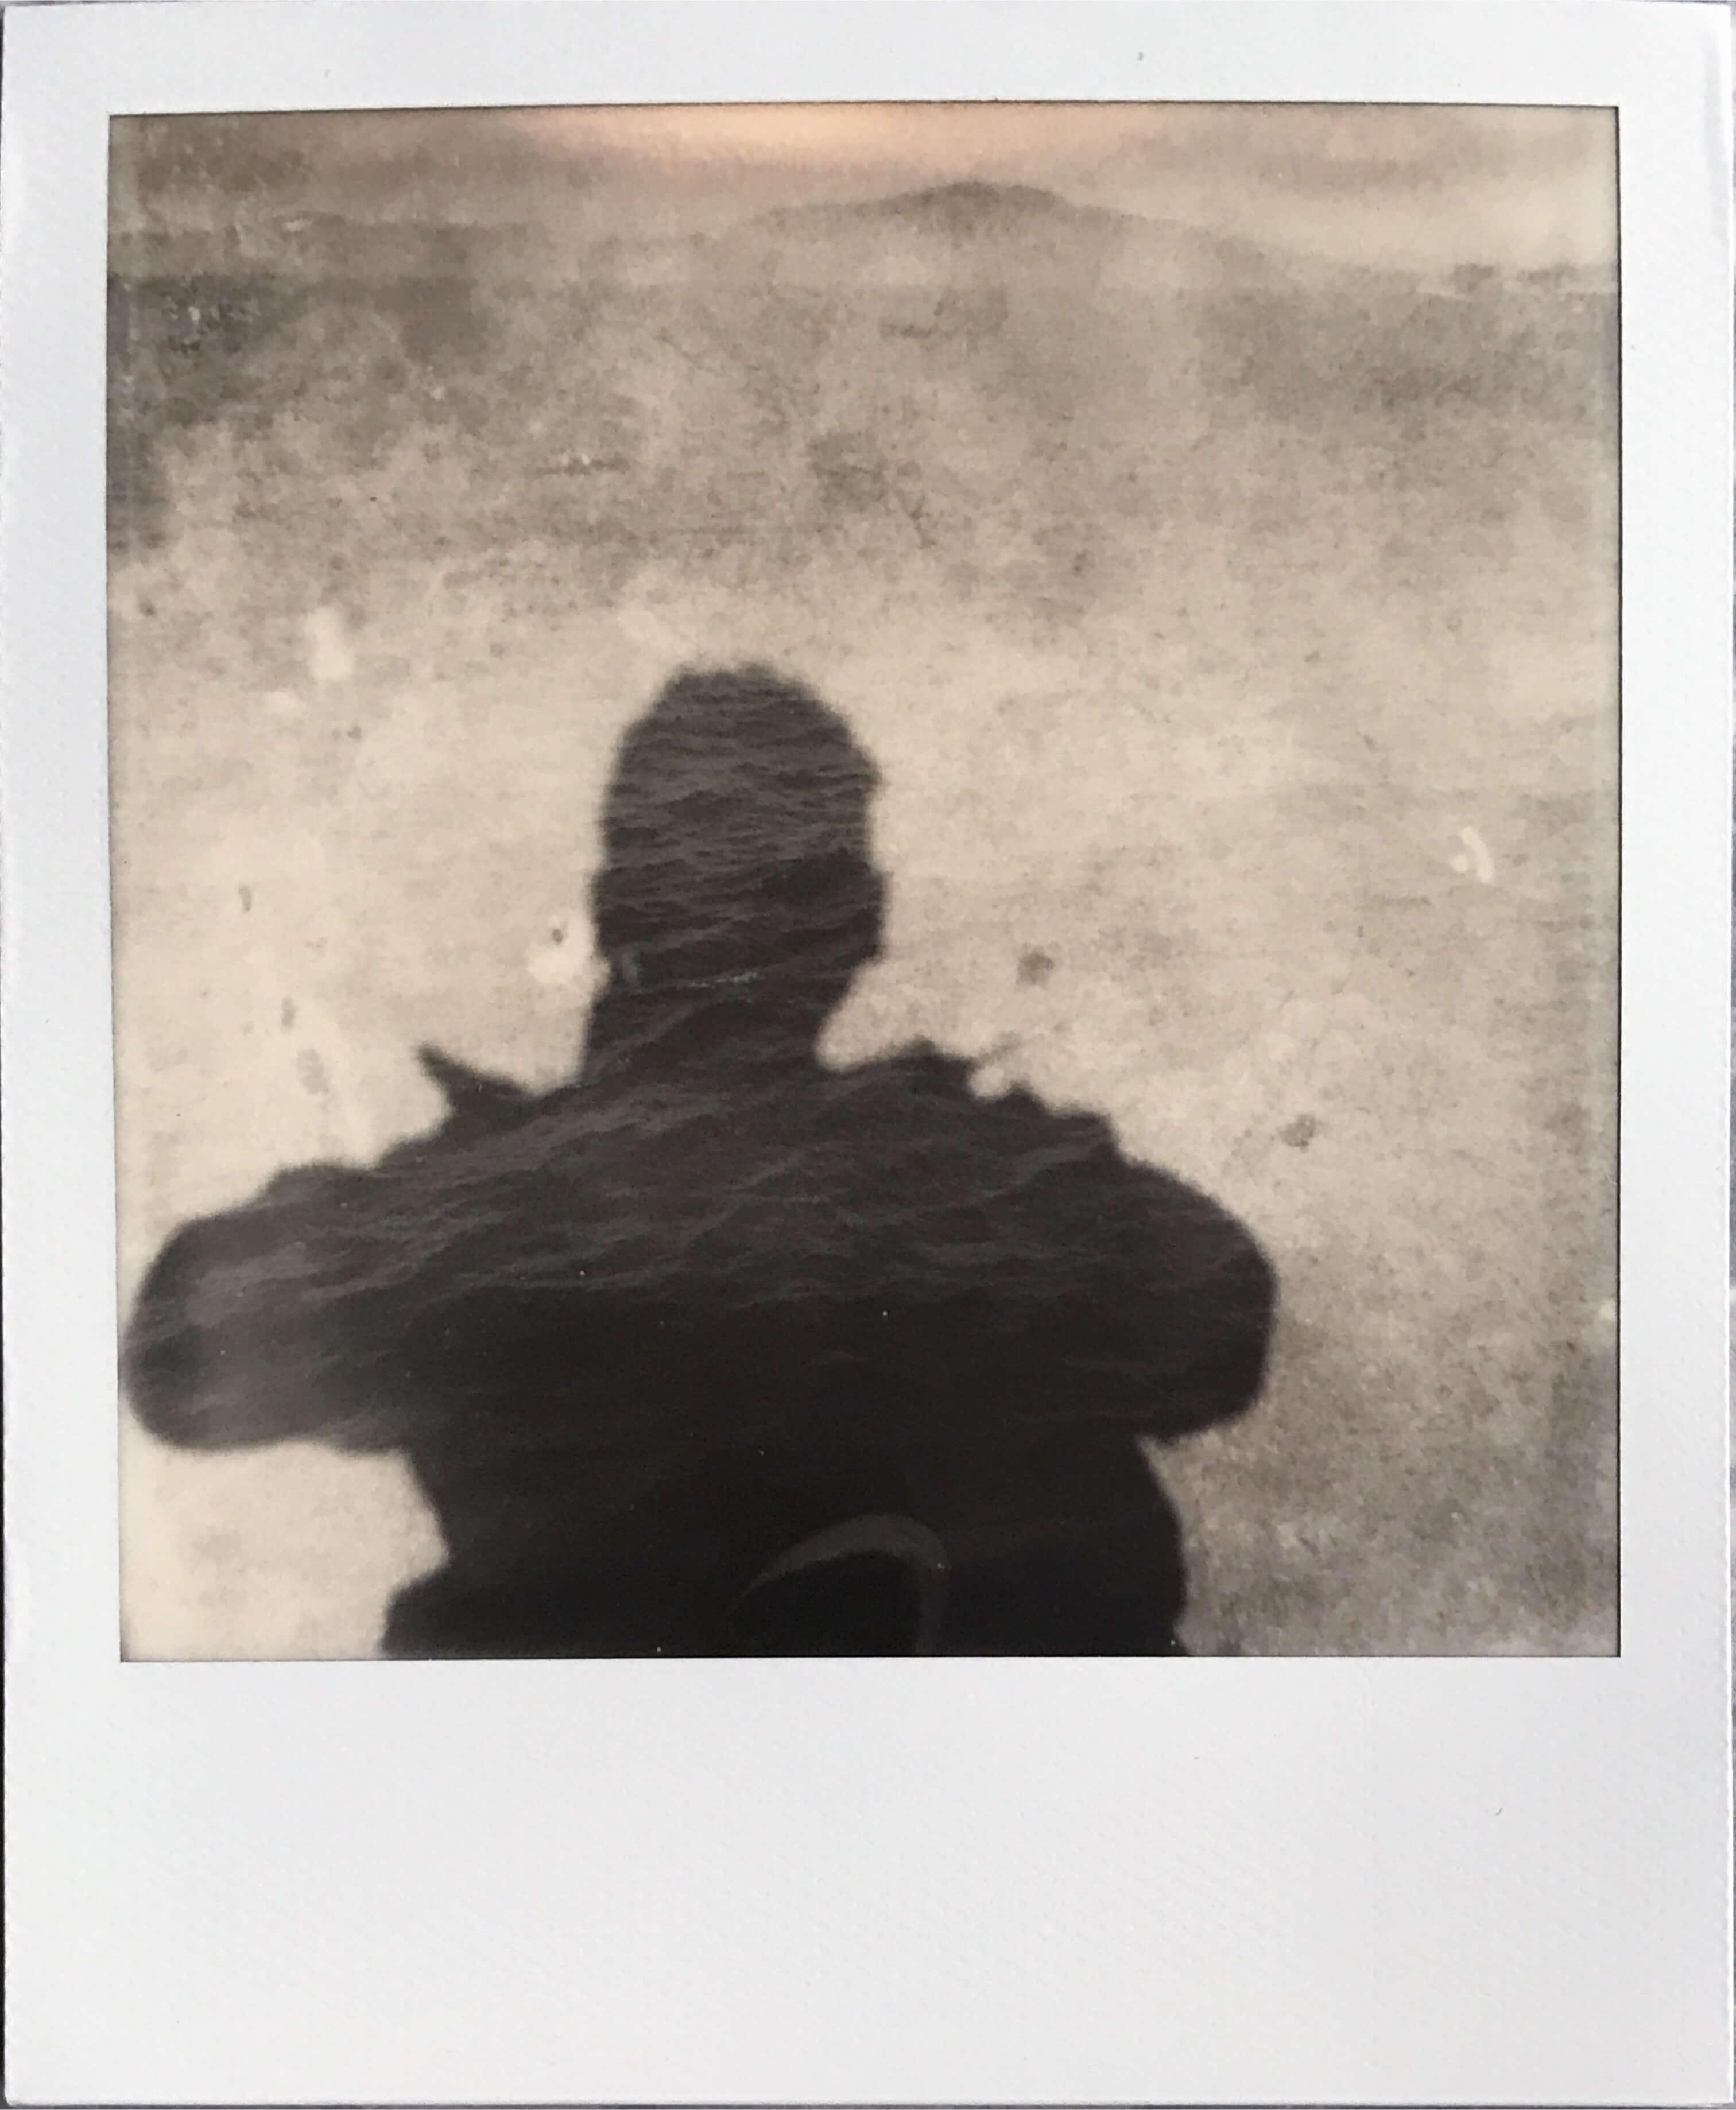 Self portrait double exposure